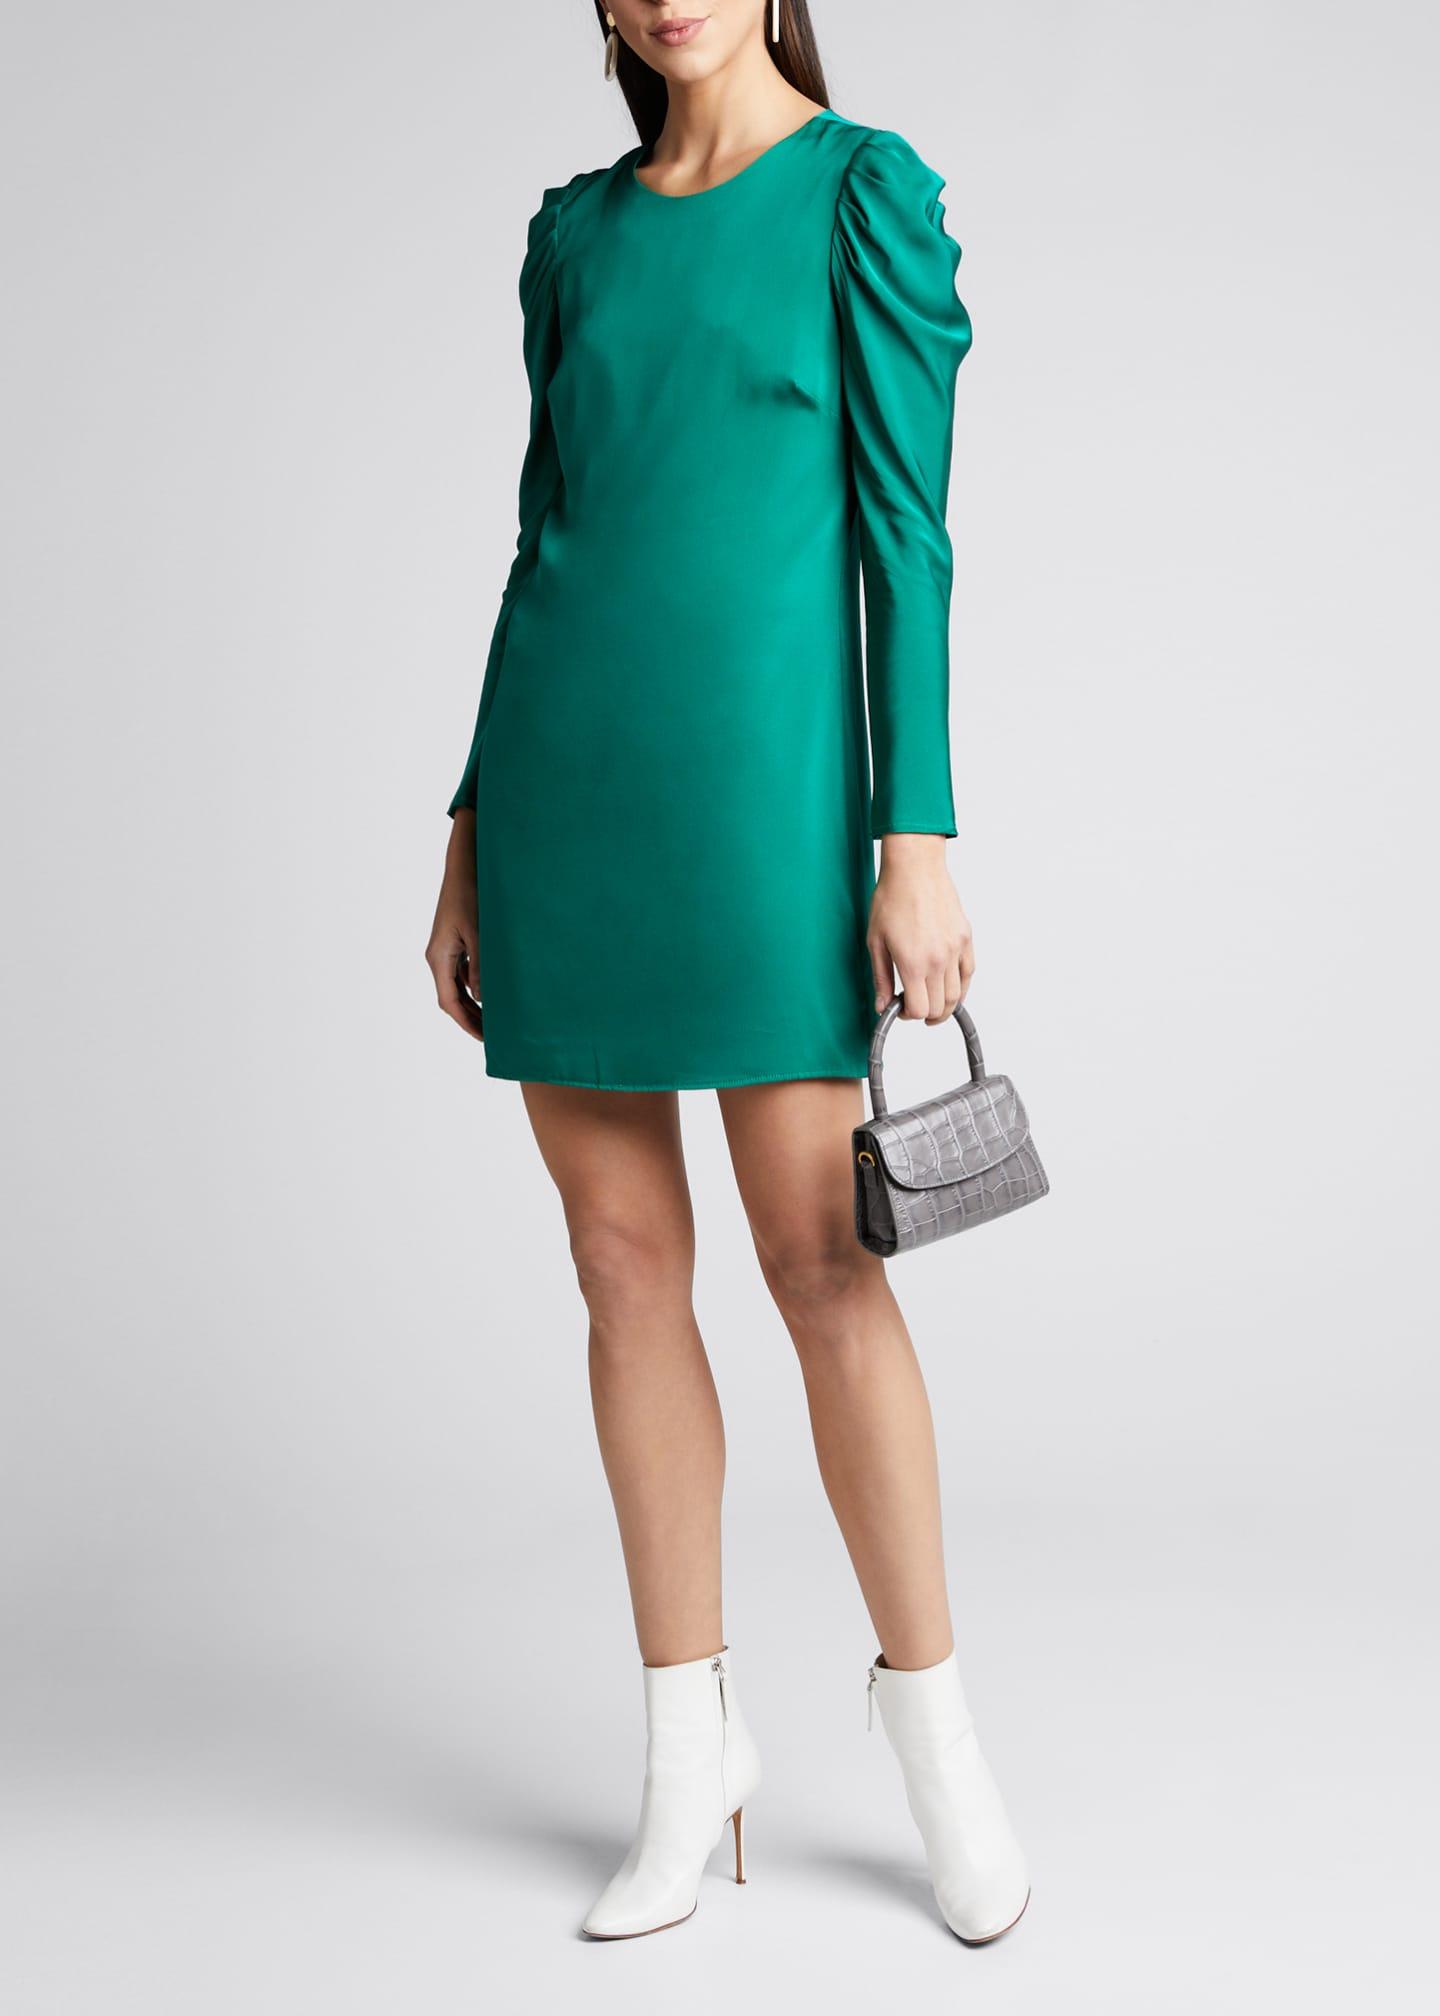 Milly Carina Draped Sleeve Mini Stretch Silk Dress